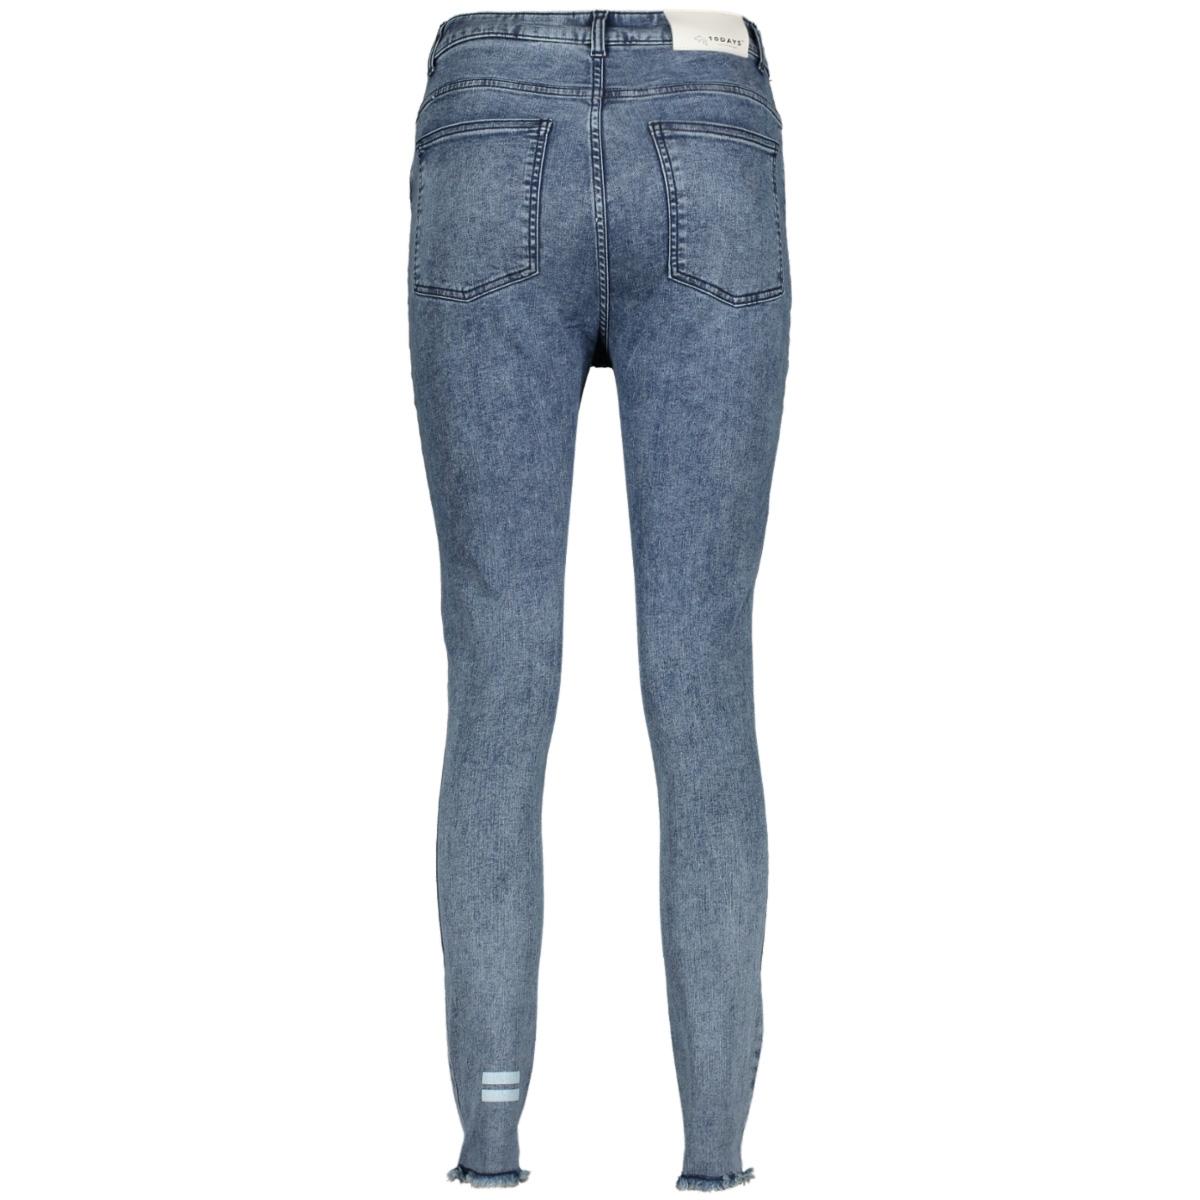 skinny denim washed 20 060 0203 10 days jeans 1082 blue